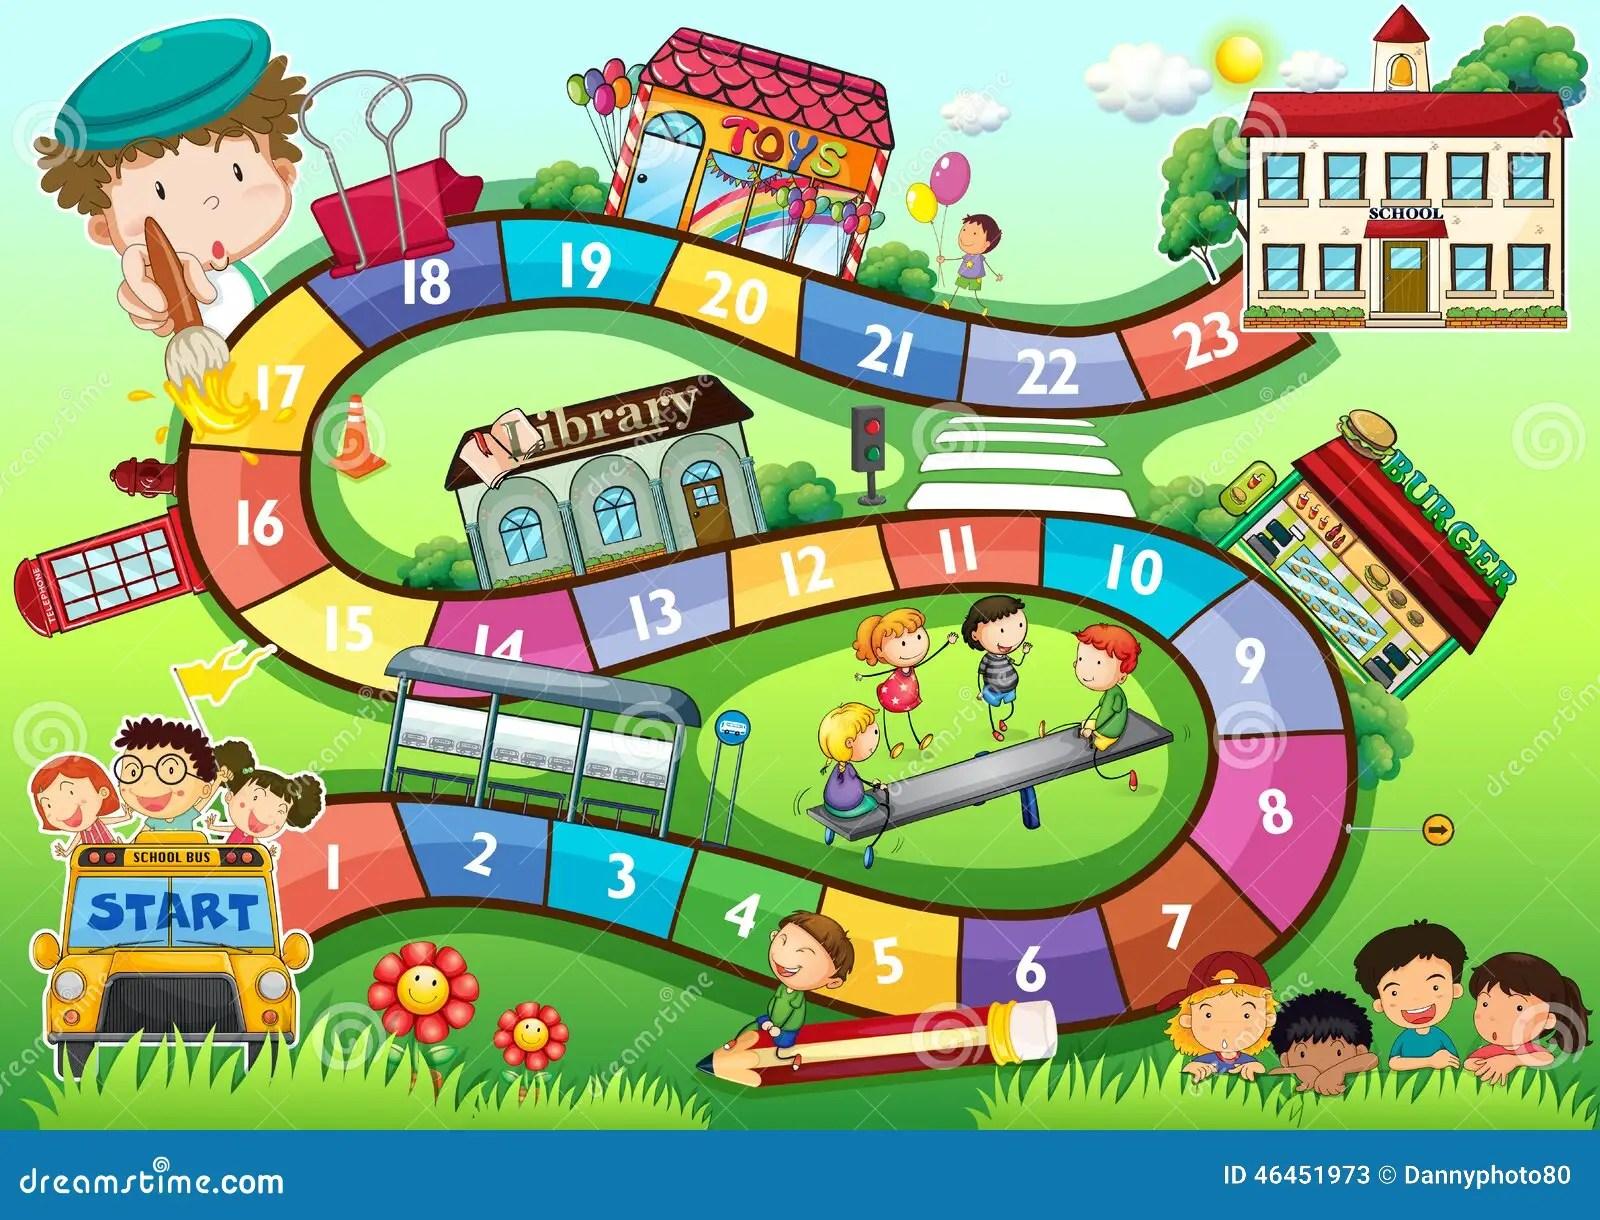 School Theme Board Game Stock Vector